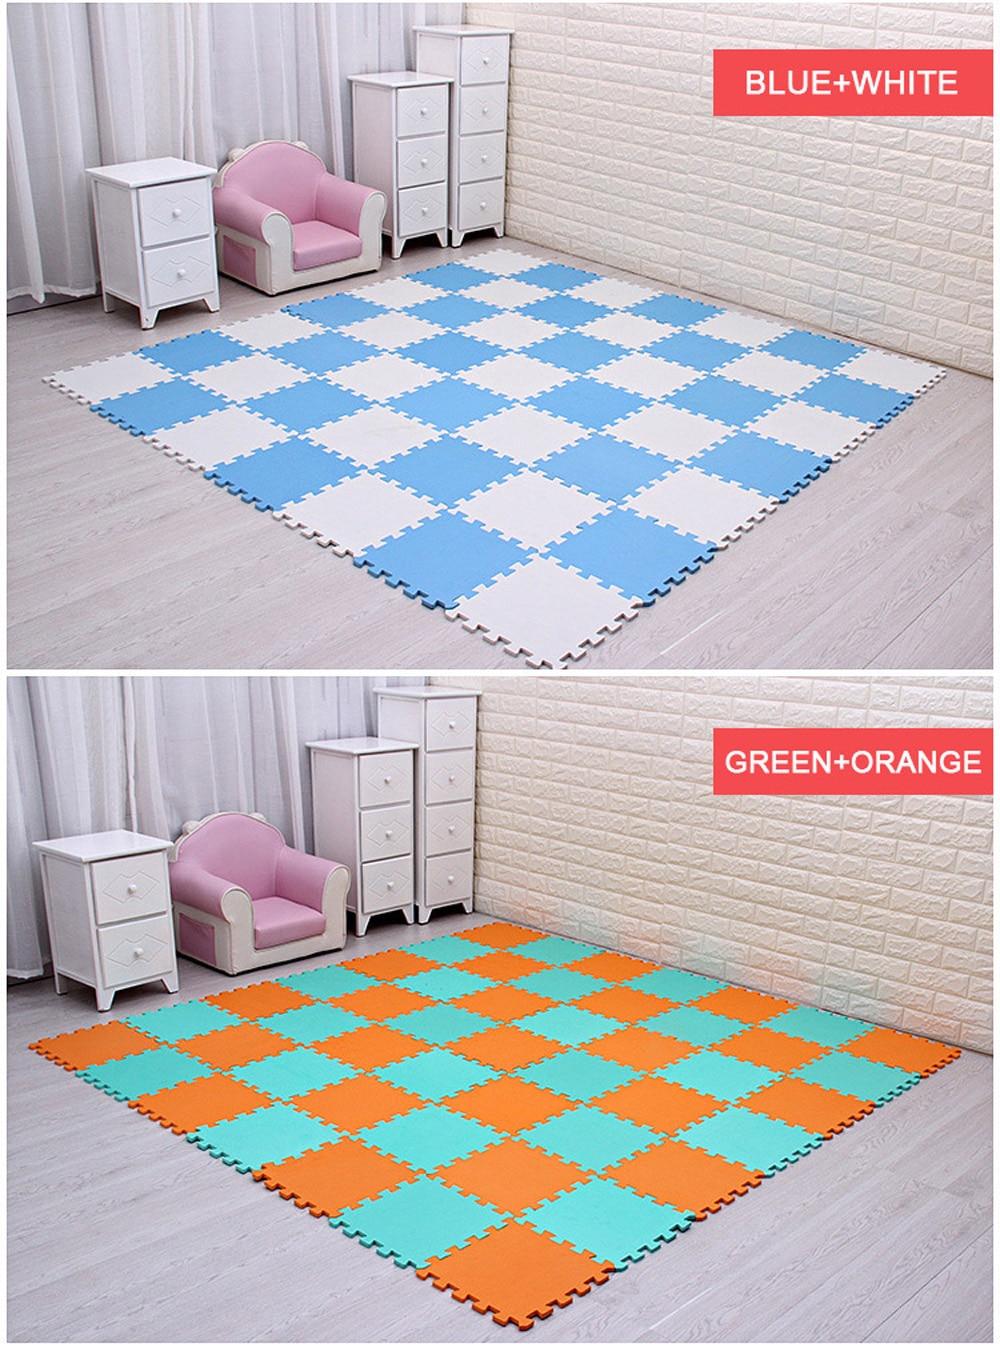 HTB1V7fOrQ9WBuNjSspeq6yz5VXaJ Newest 9/18pcs/set EVA Children's Foam Carpet Mosaic floor Puzzle Carpet Baby Play Mat Floor Developing Crawling Rugs Puzzle Mat